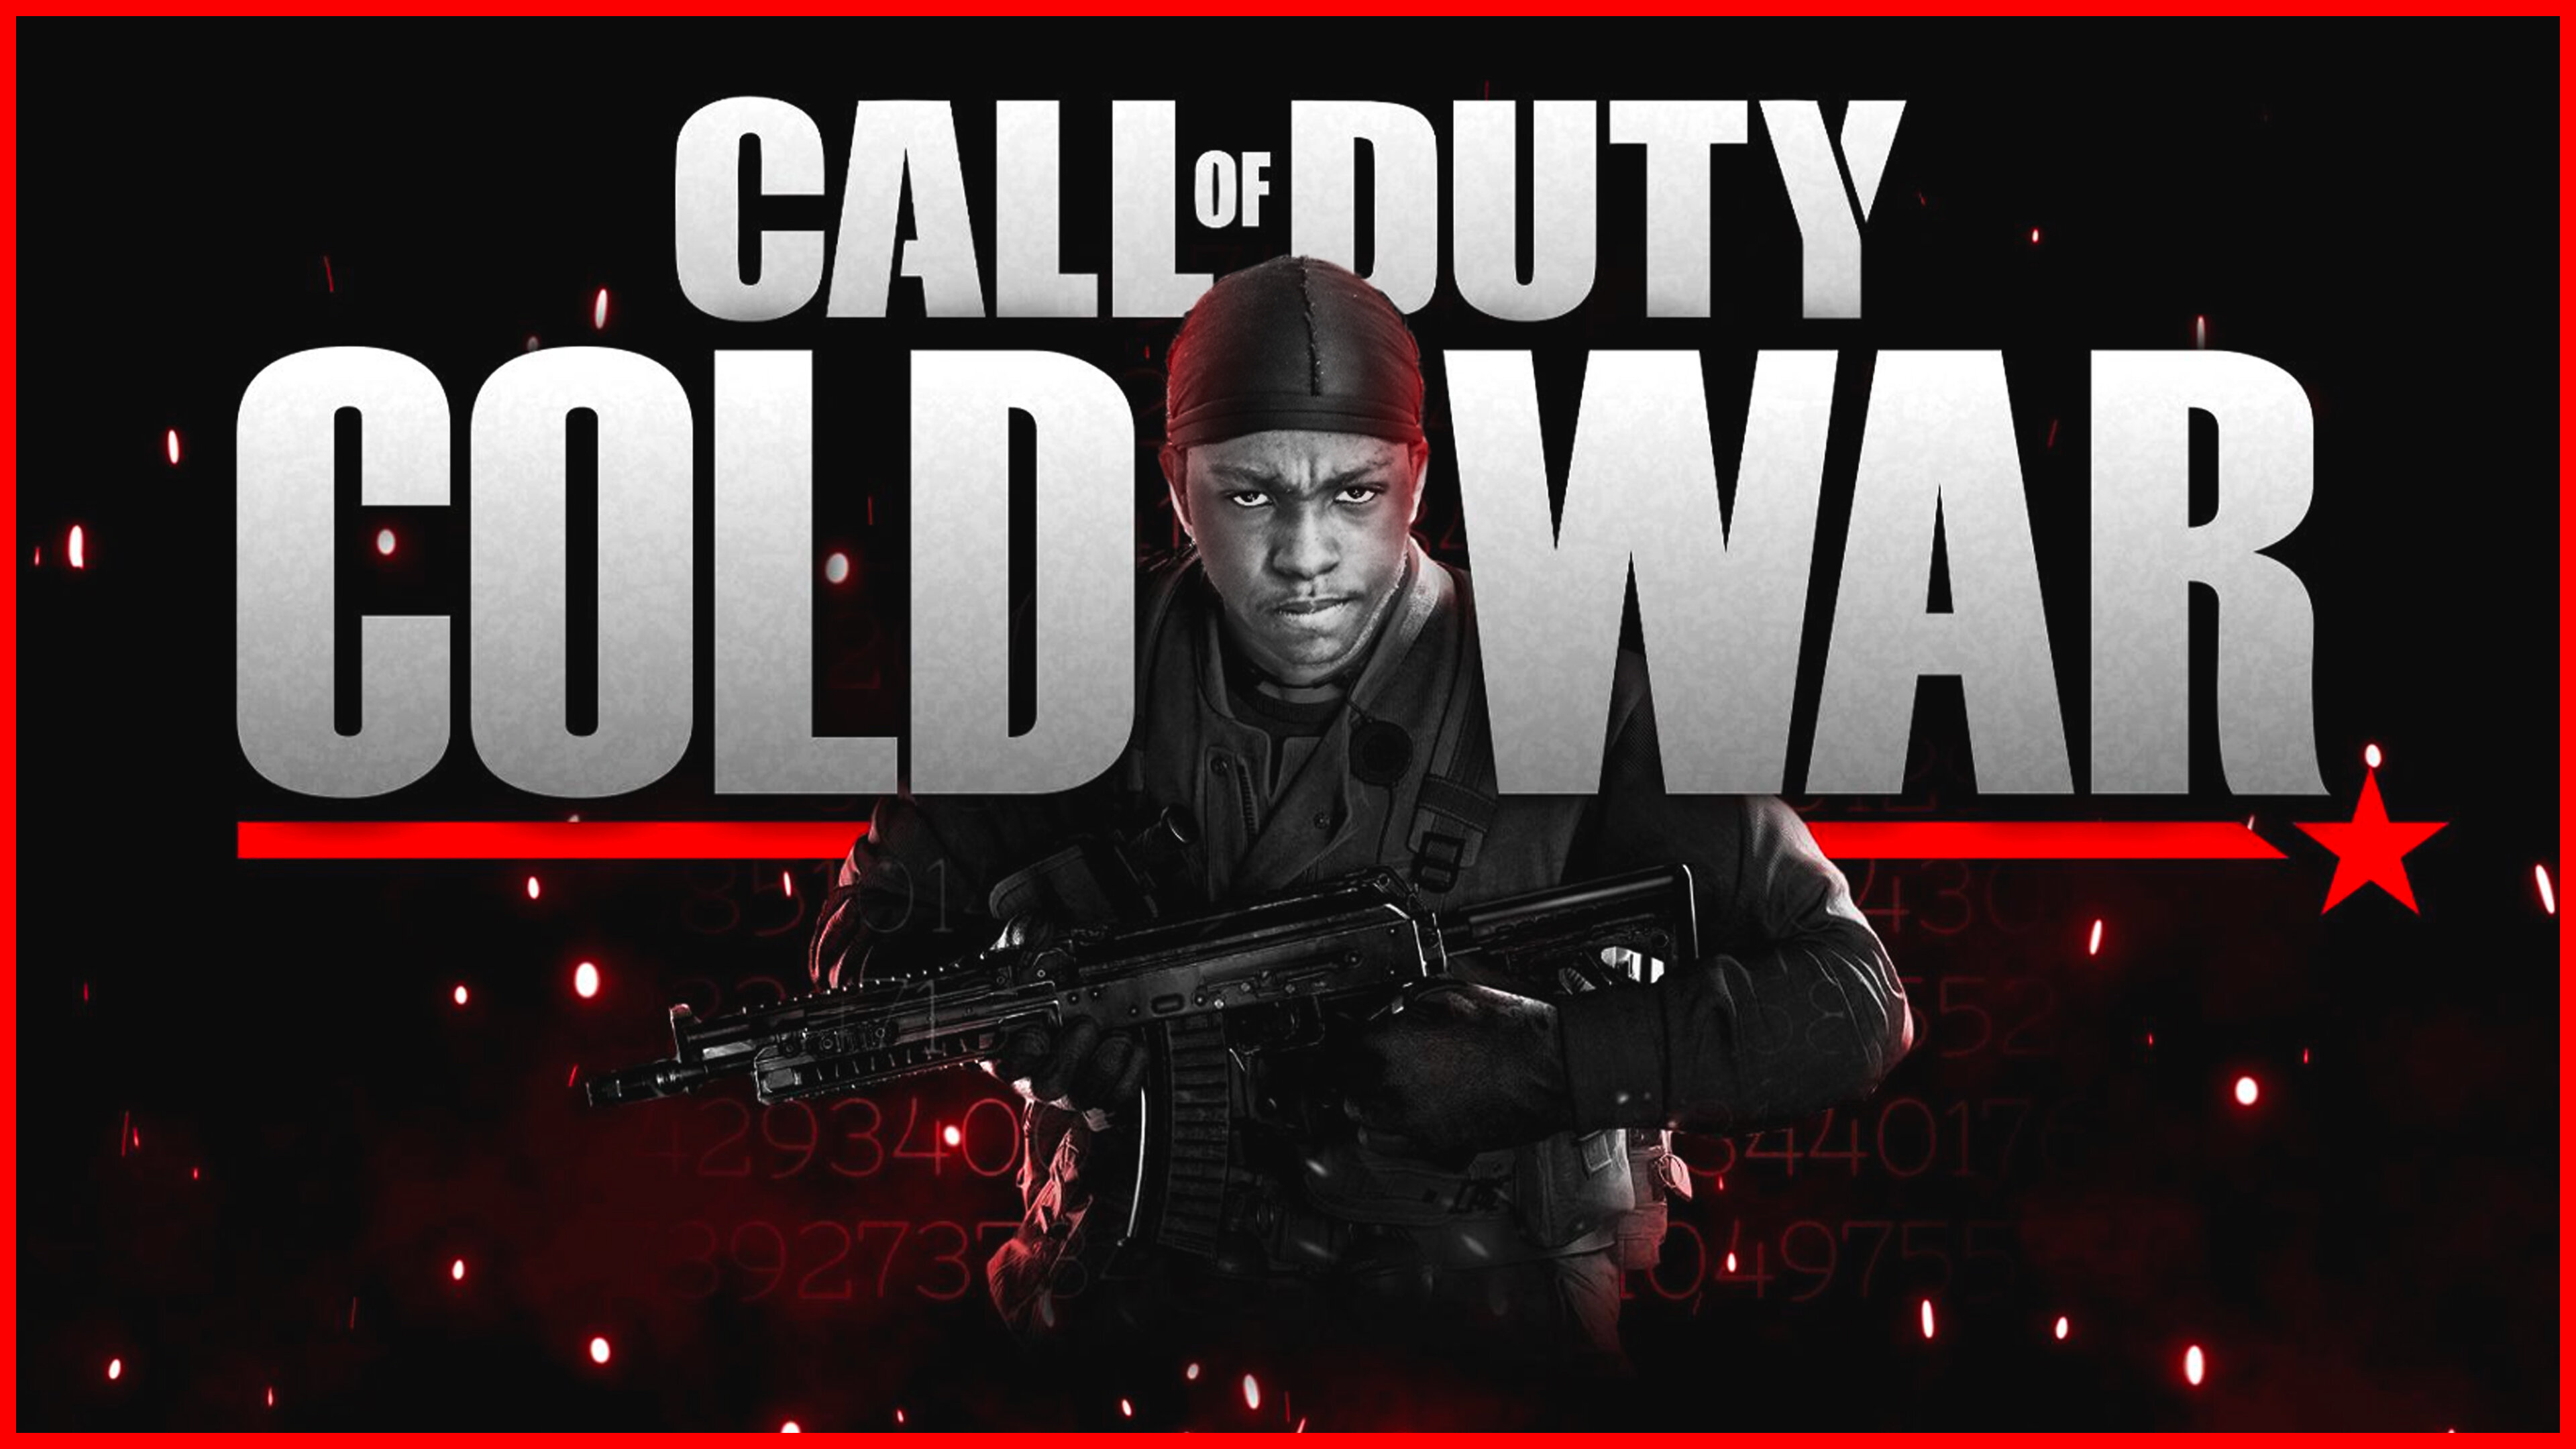 Call of Duty Customs